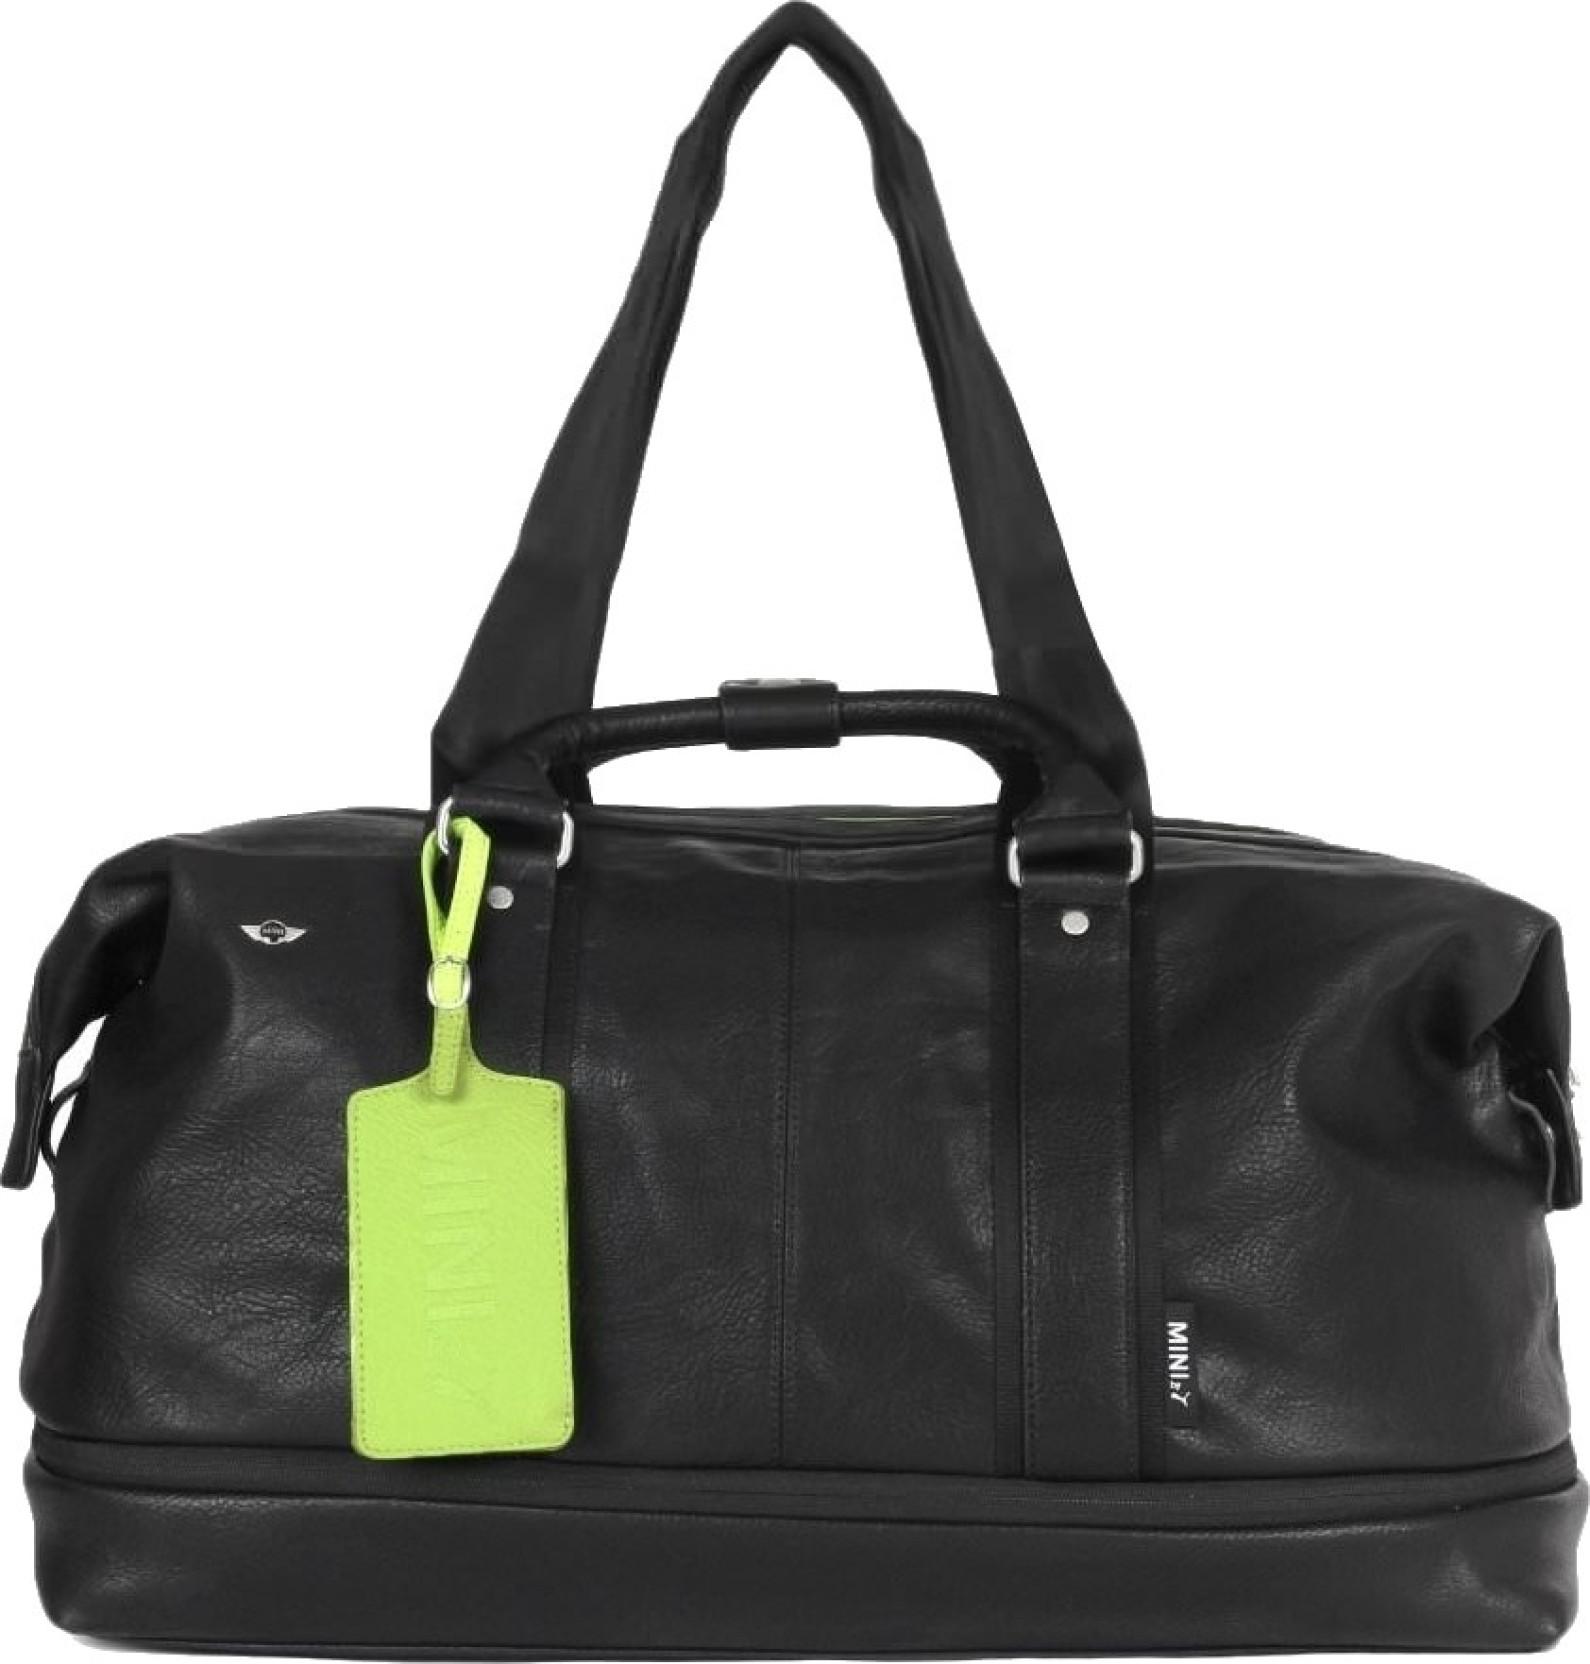 d3bf704937 ... Mini Lifestyle Weekender Travel Duffel Bag. Home